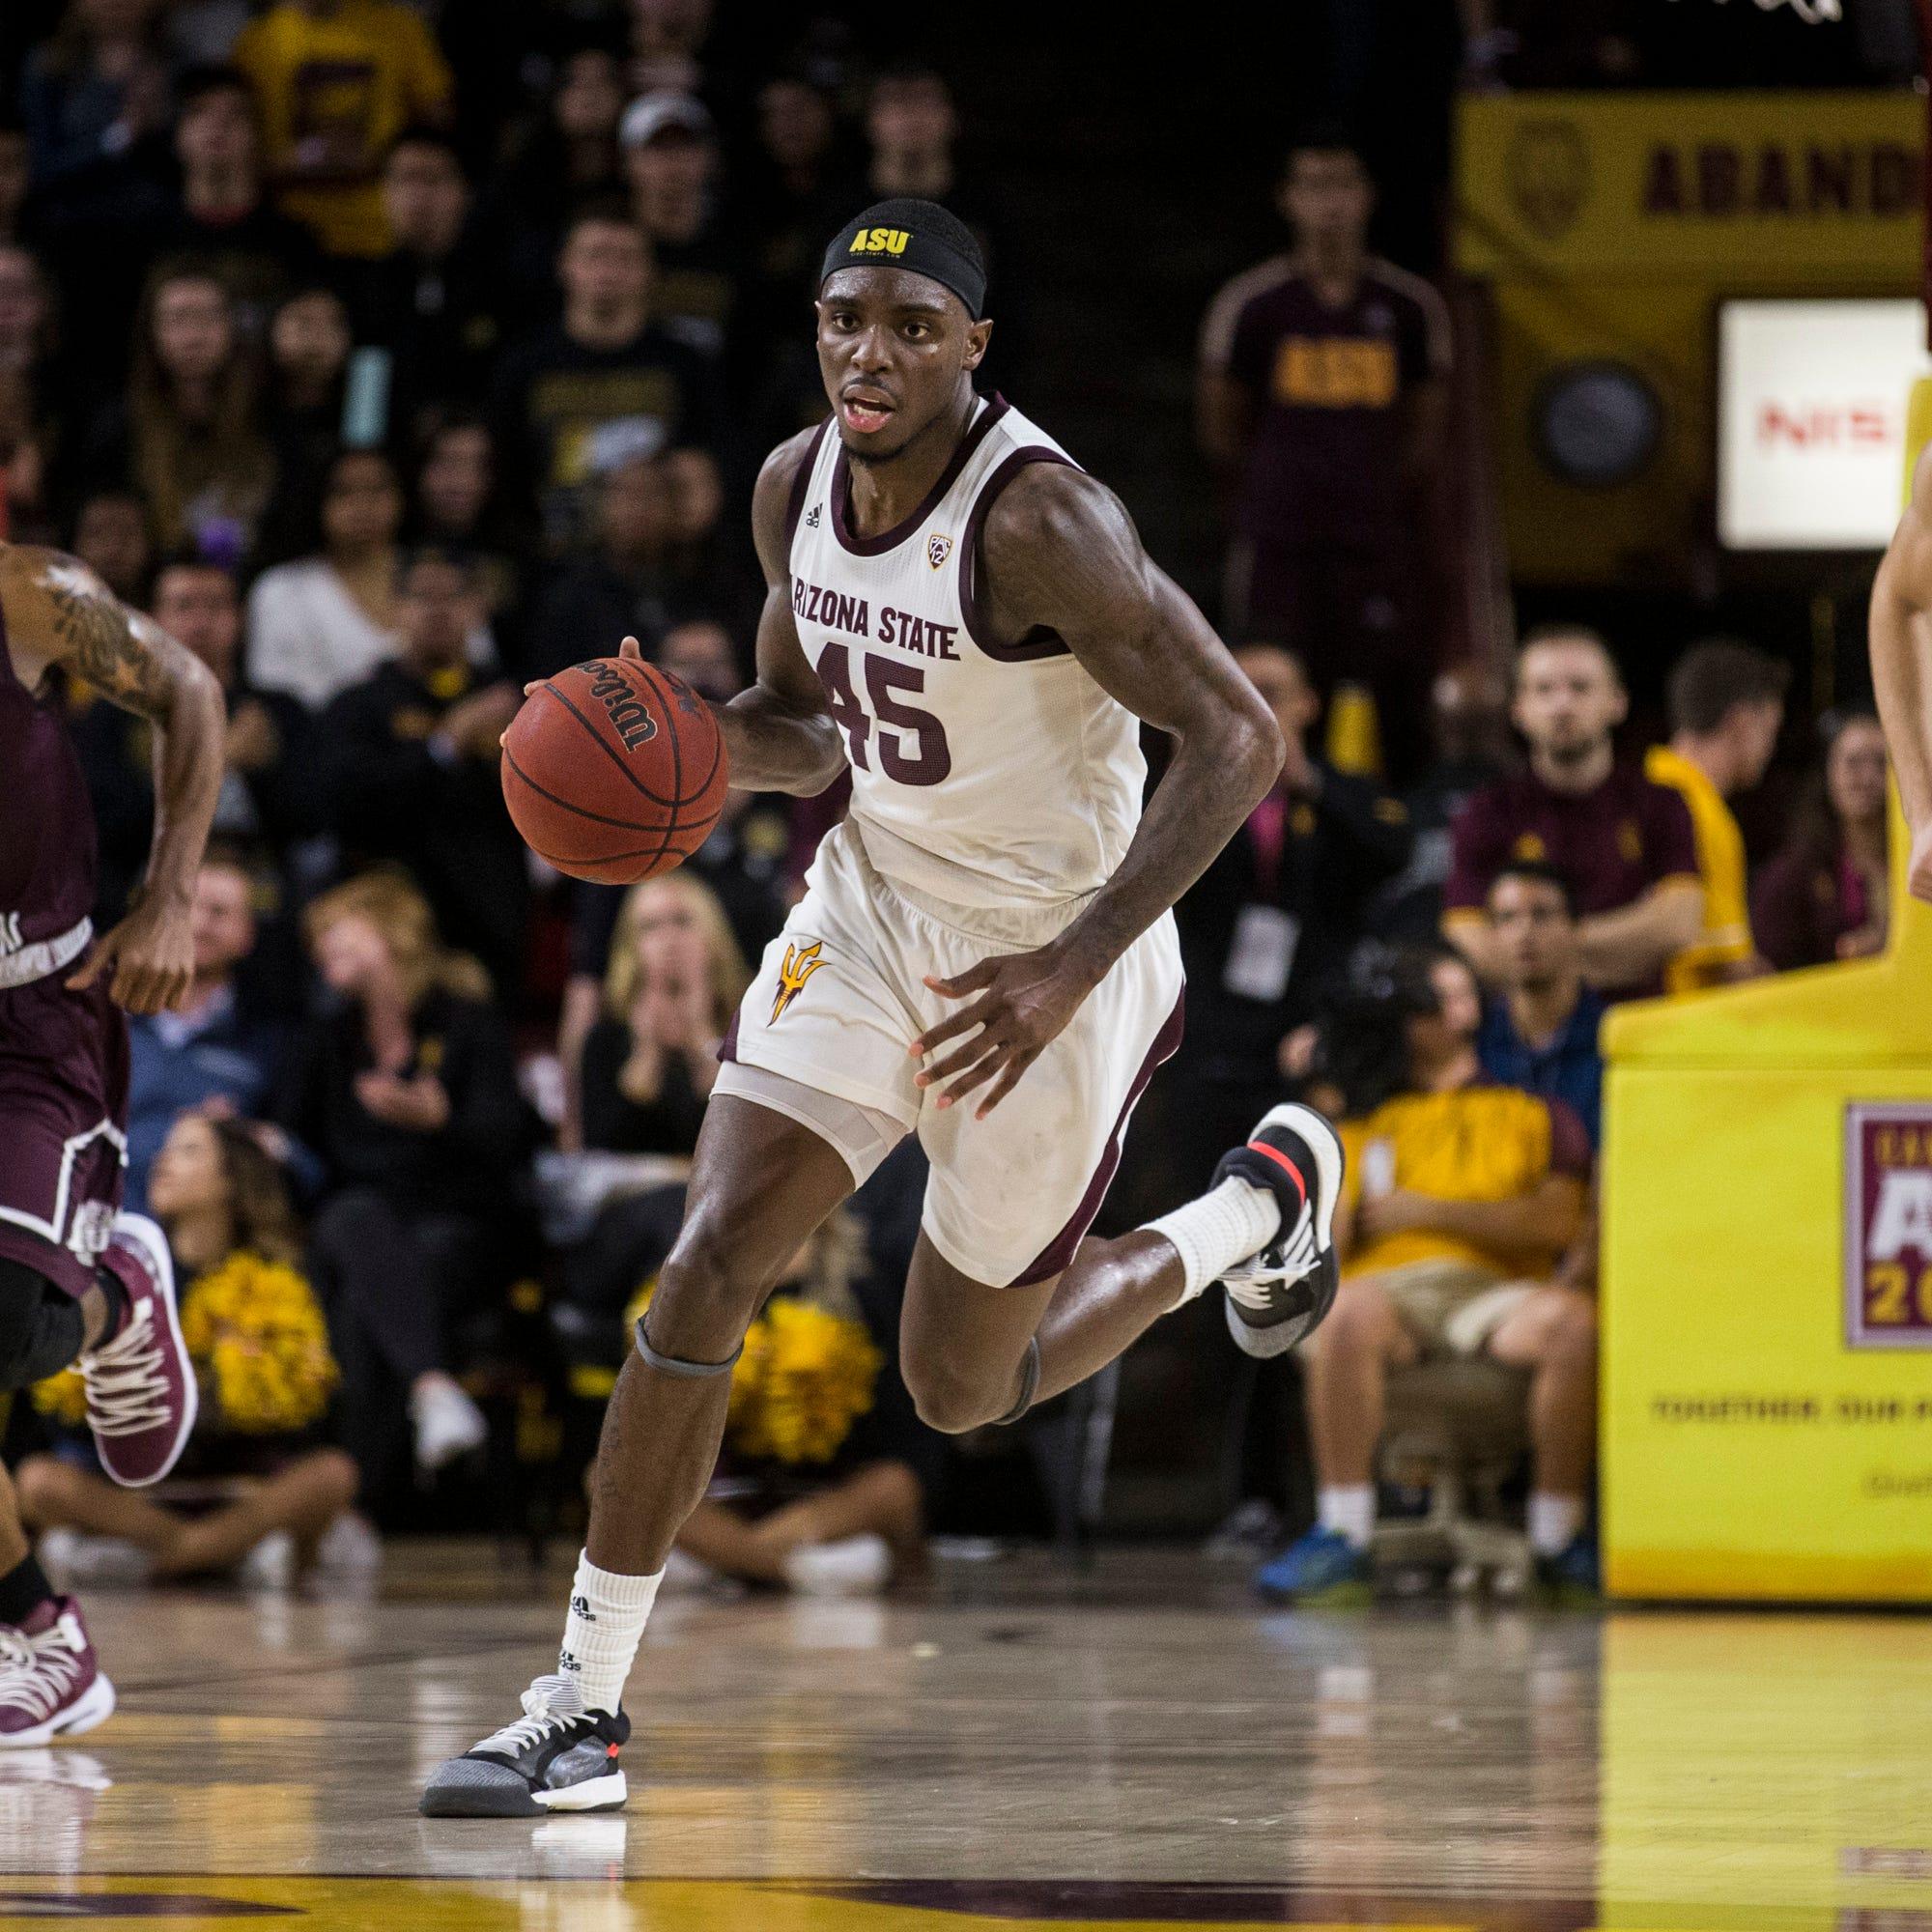 ASU basketball ready for a showdown against fellow unbeaten No. 6 Nevada